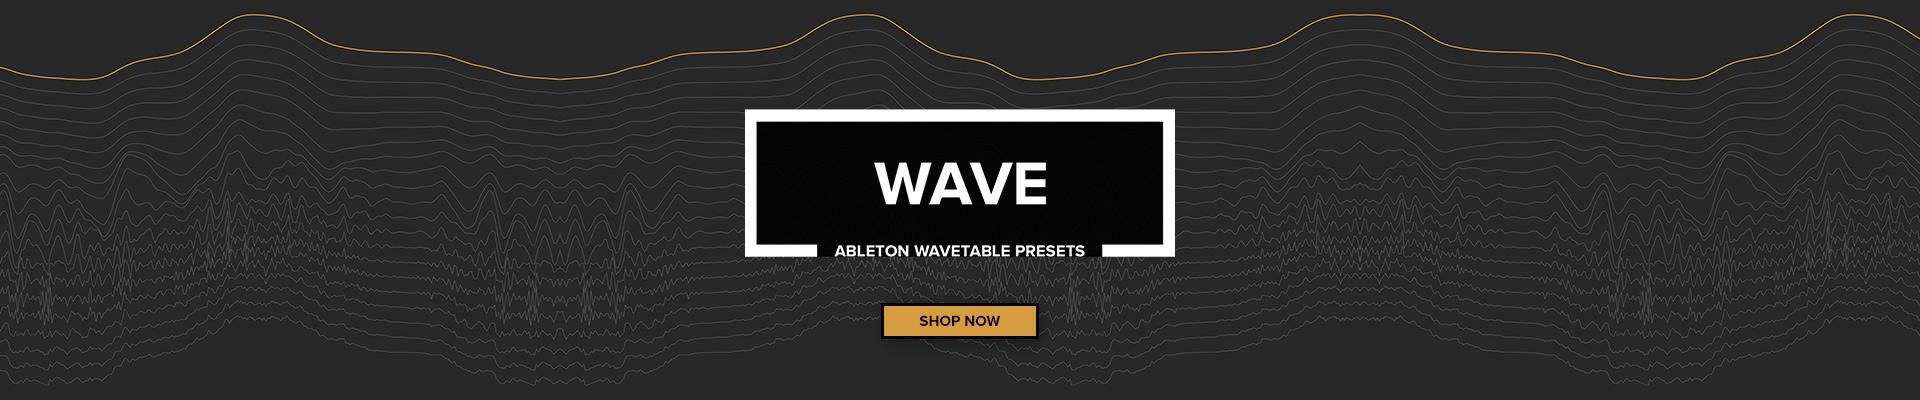 wavetable presets